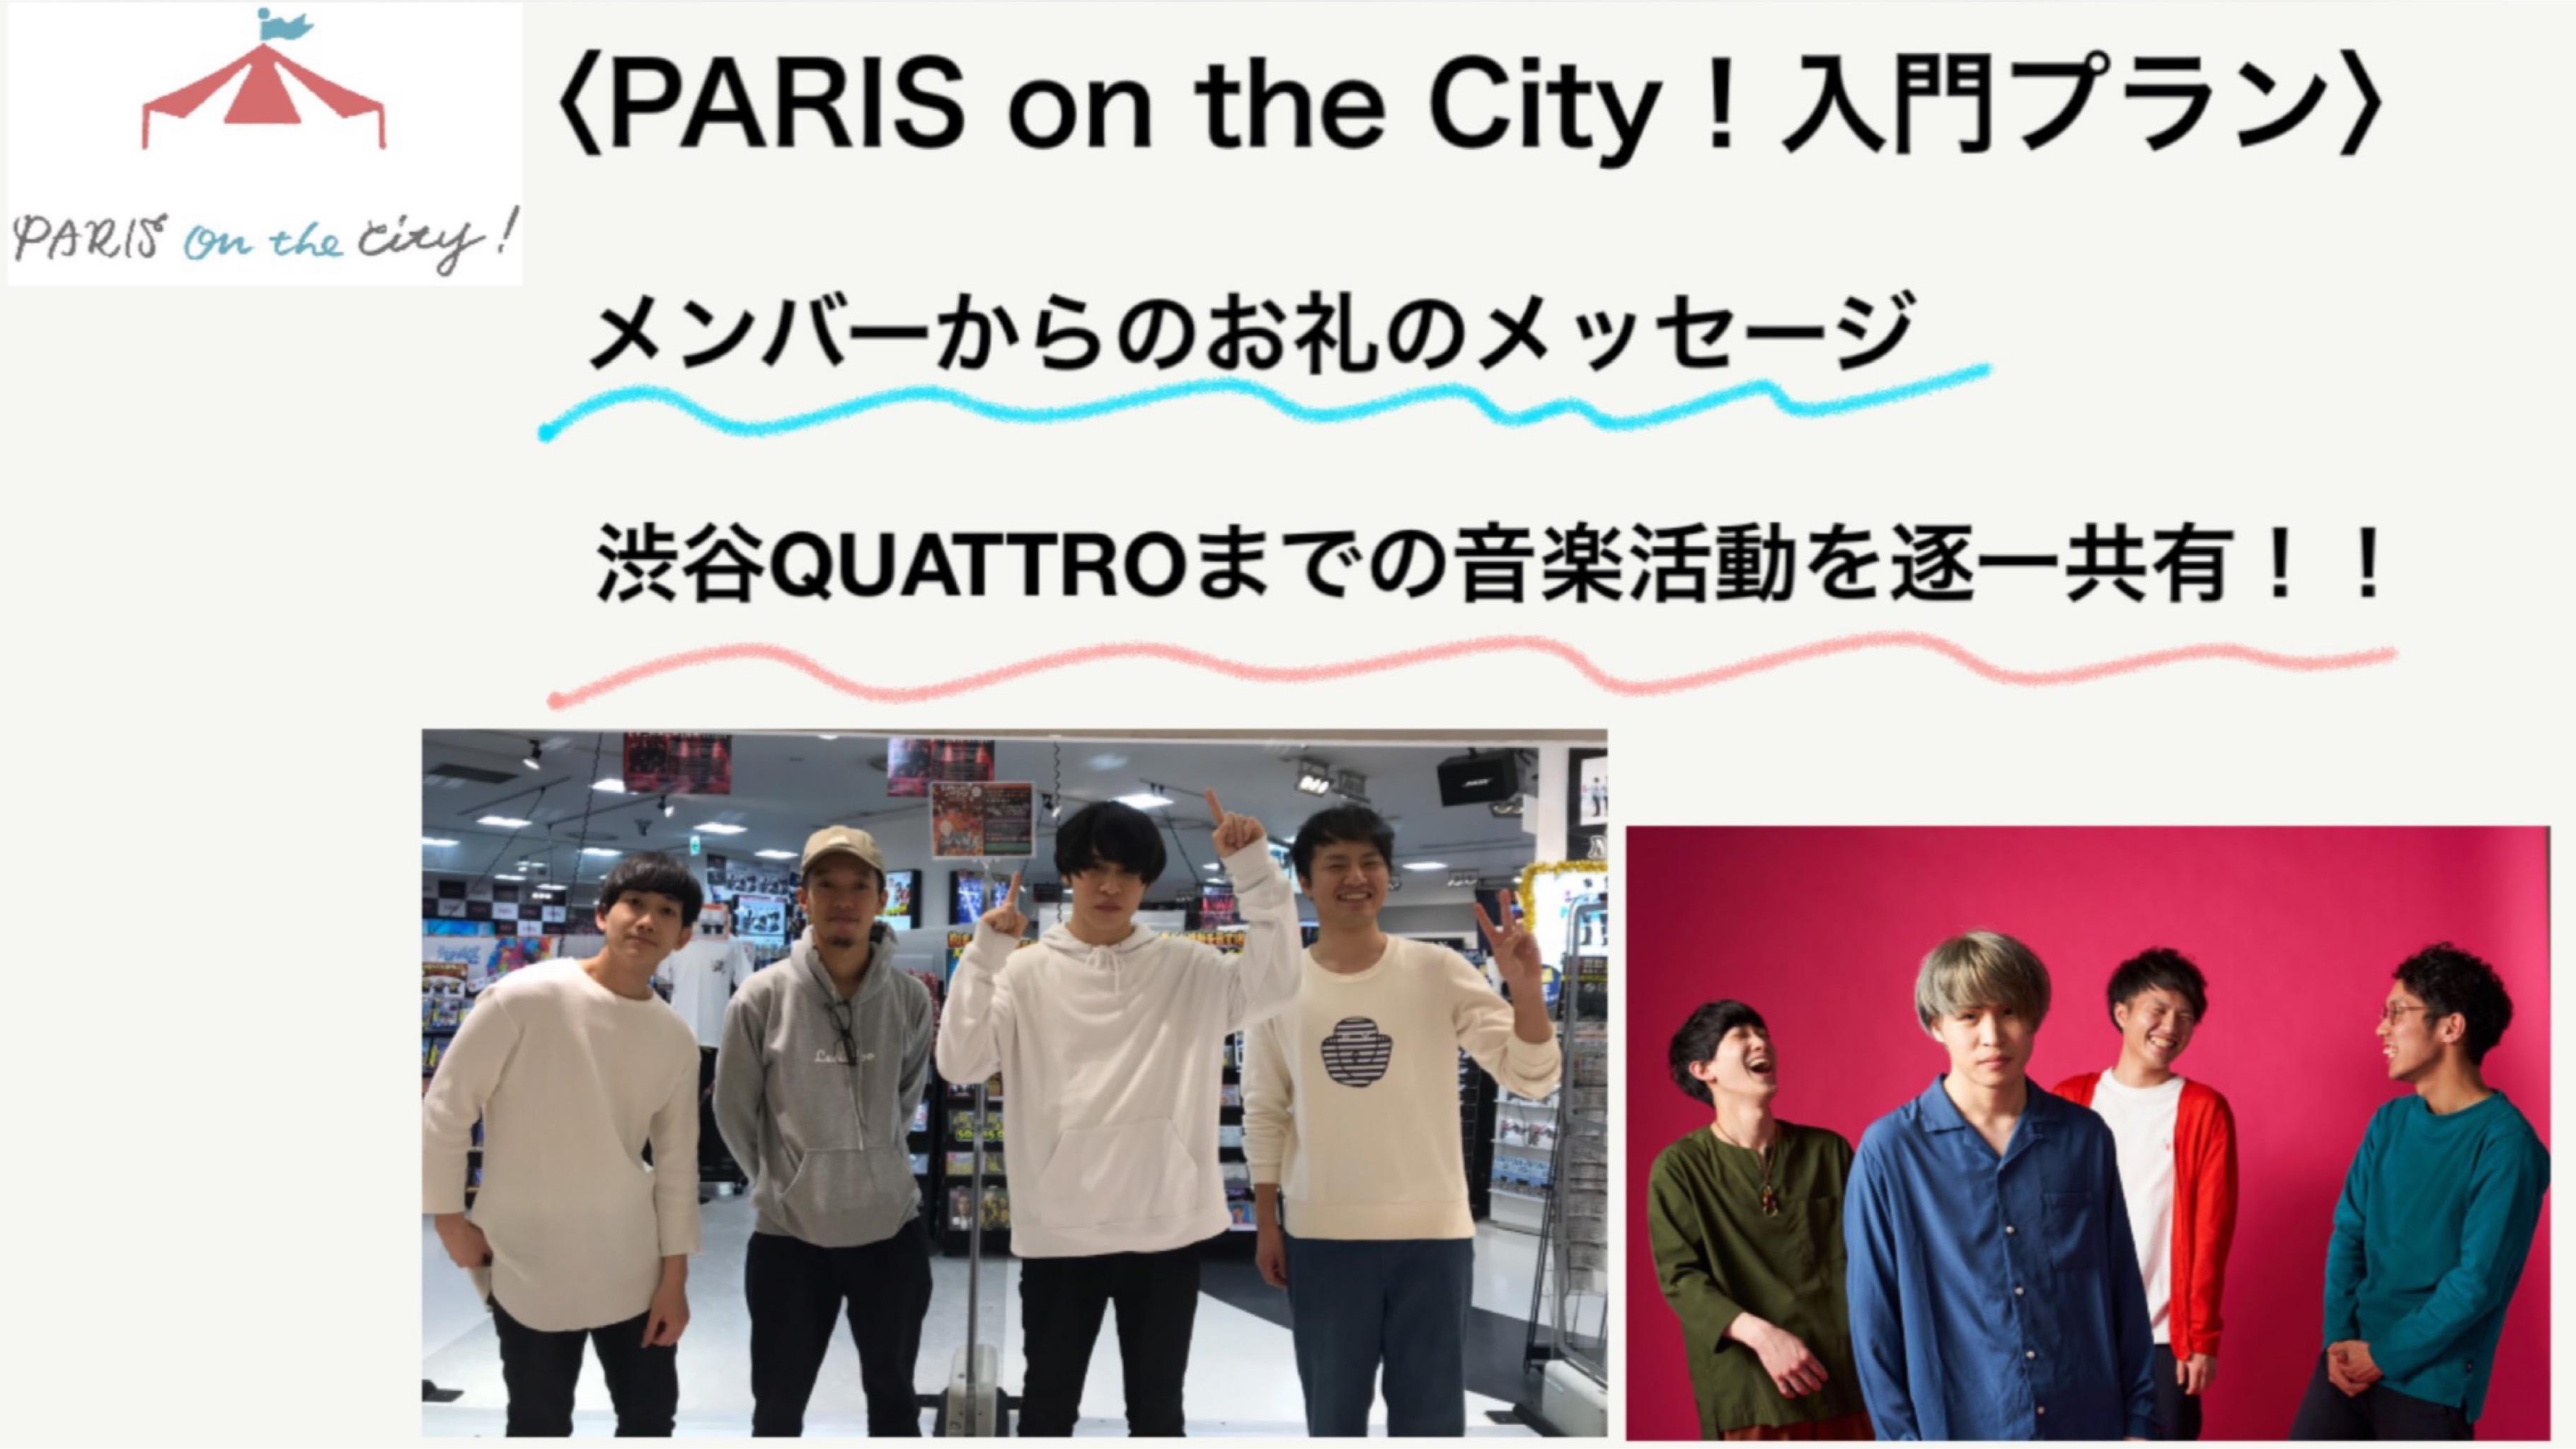 <PARIS on the City!入門プラン>